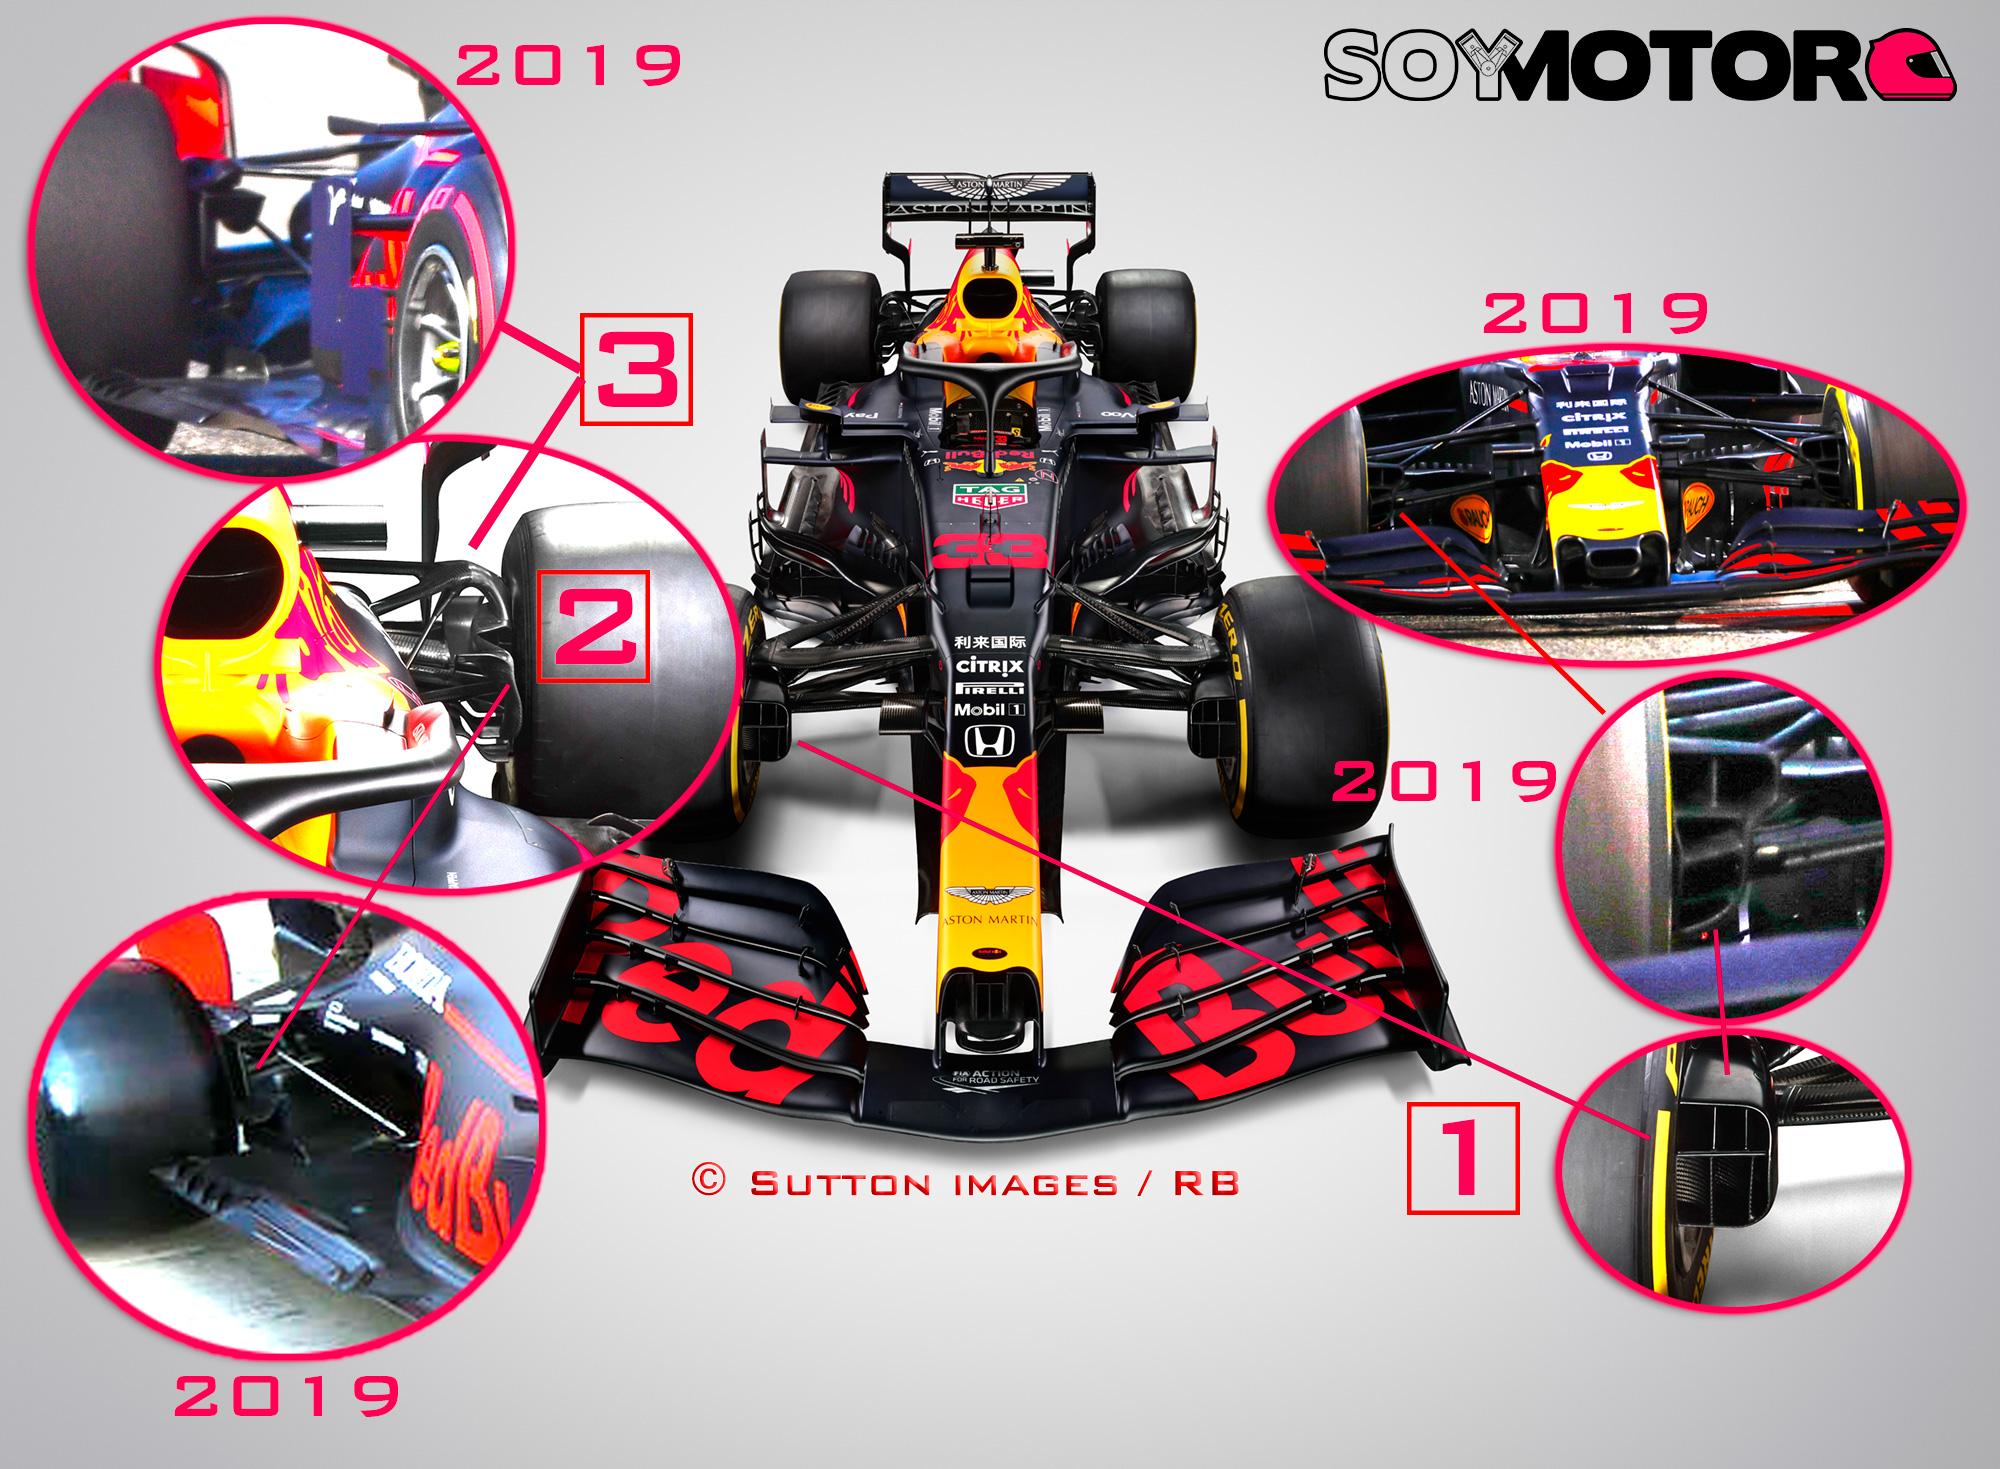 red-bull-suspension-trasera-paletas-frenos-delanteros-soymotor.jpg